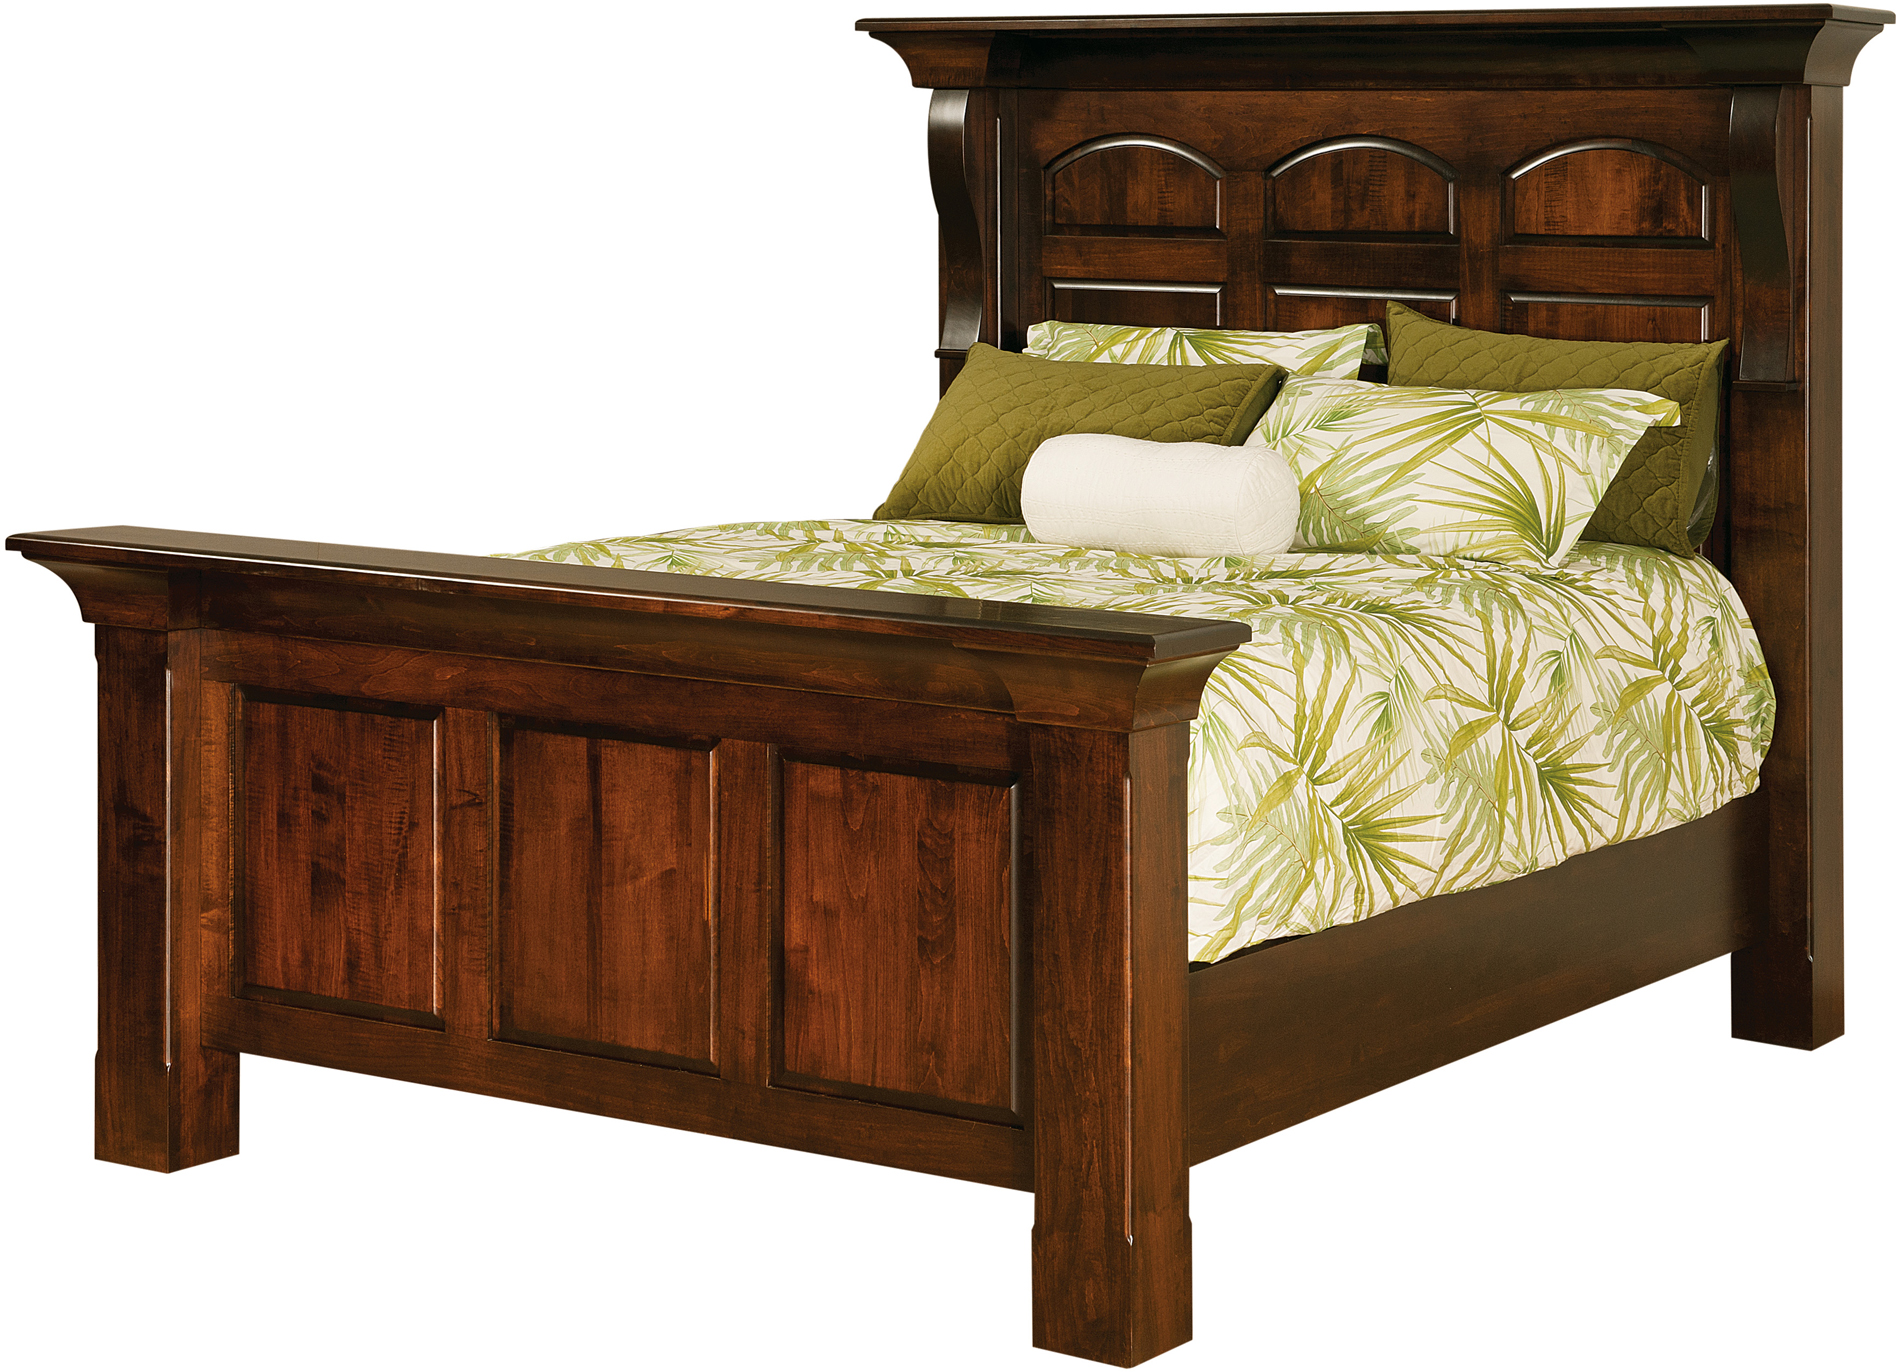 Hamilton Court Bed Customizable Hamilton Court Bed